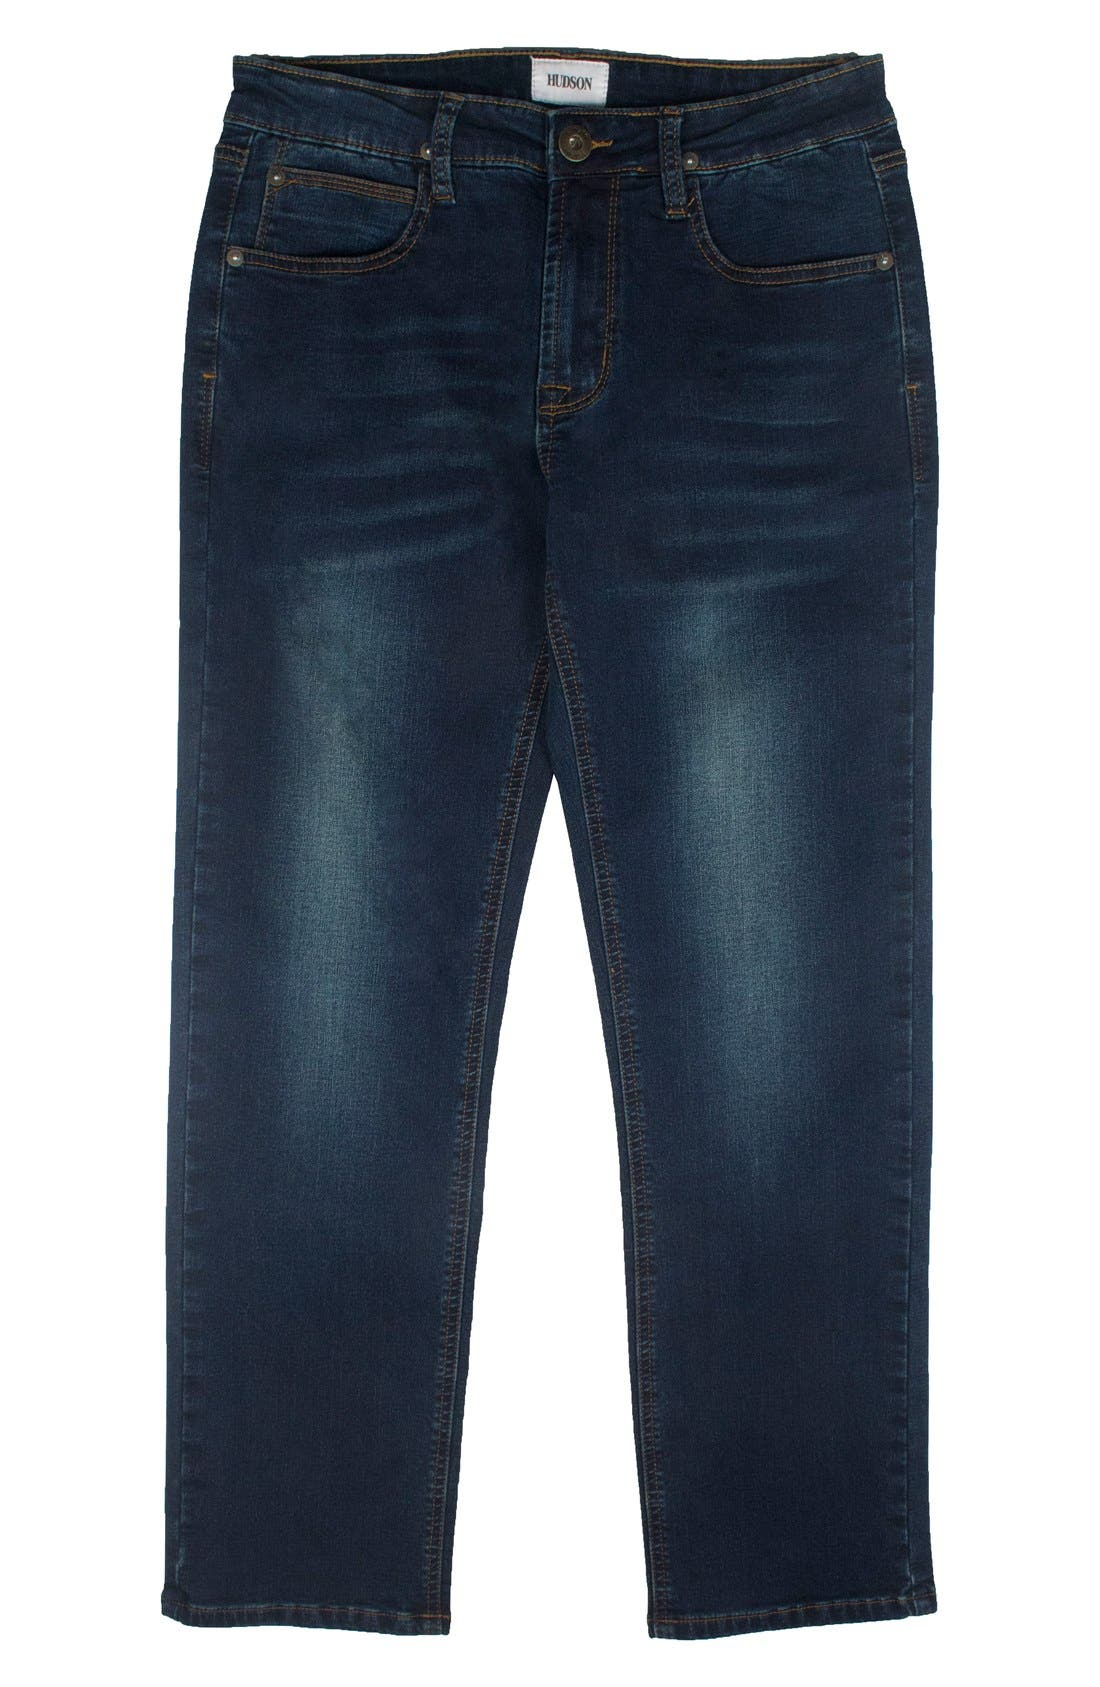 Jagger Straight Leg Jeans,                         Main,                         color, 426